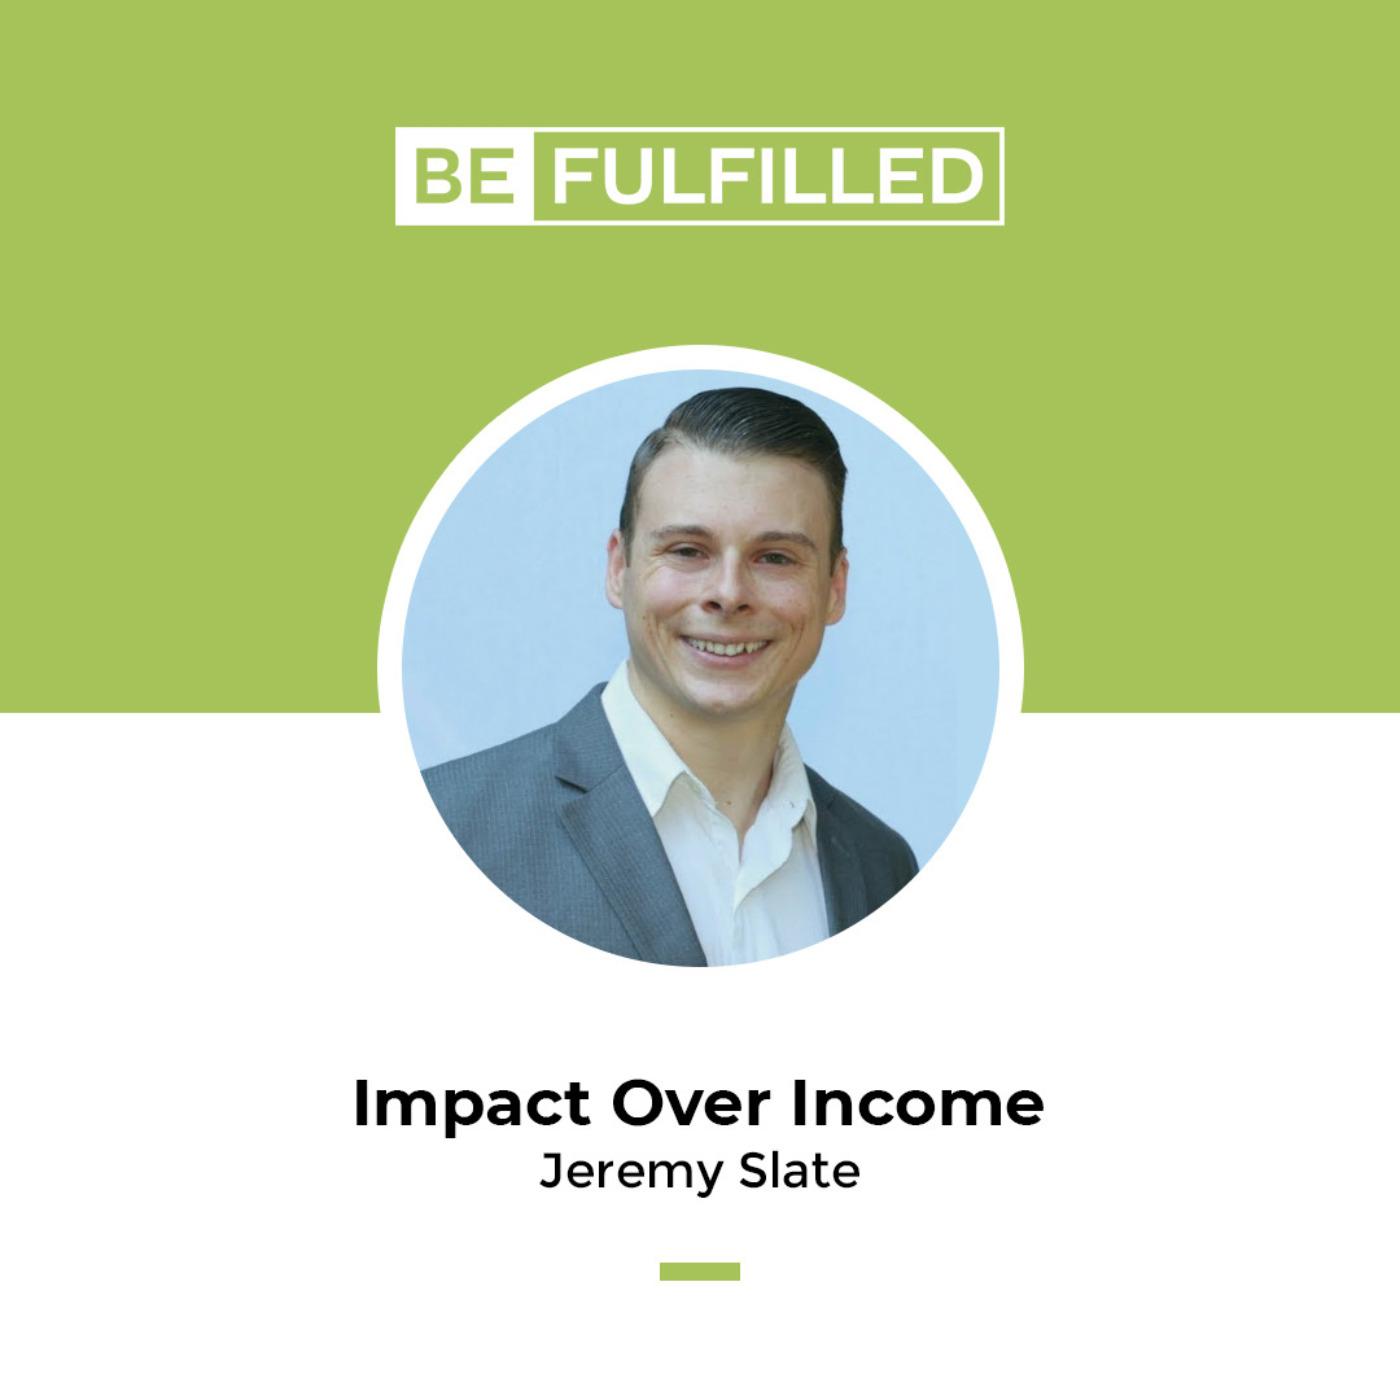 Impact Over Income - Jeremy Slate